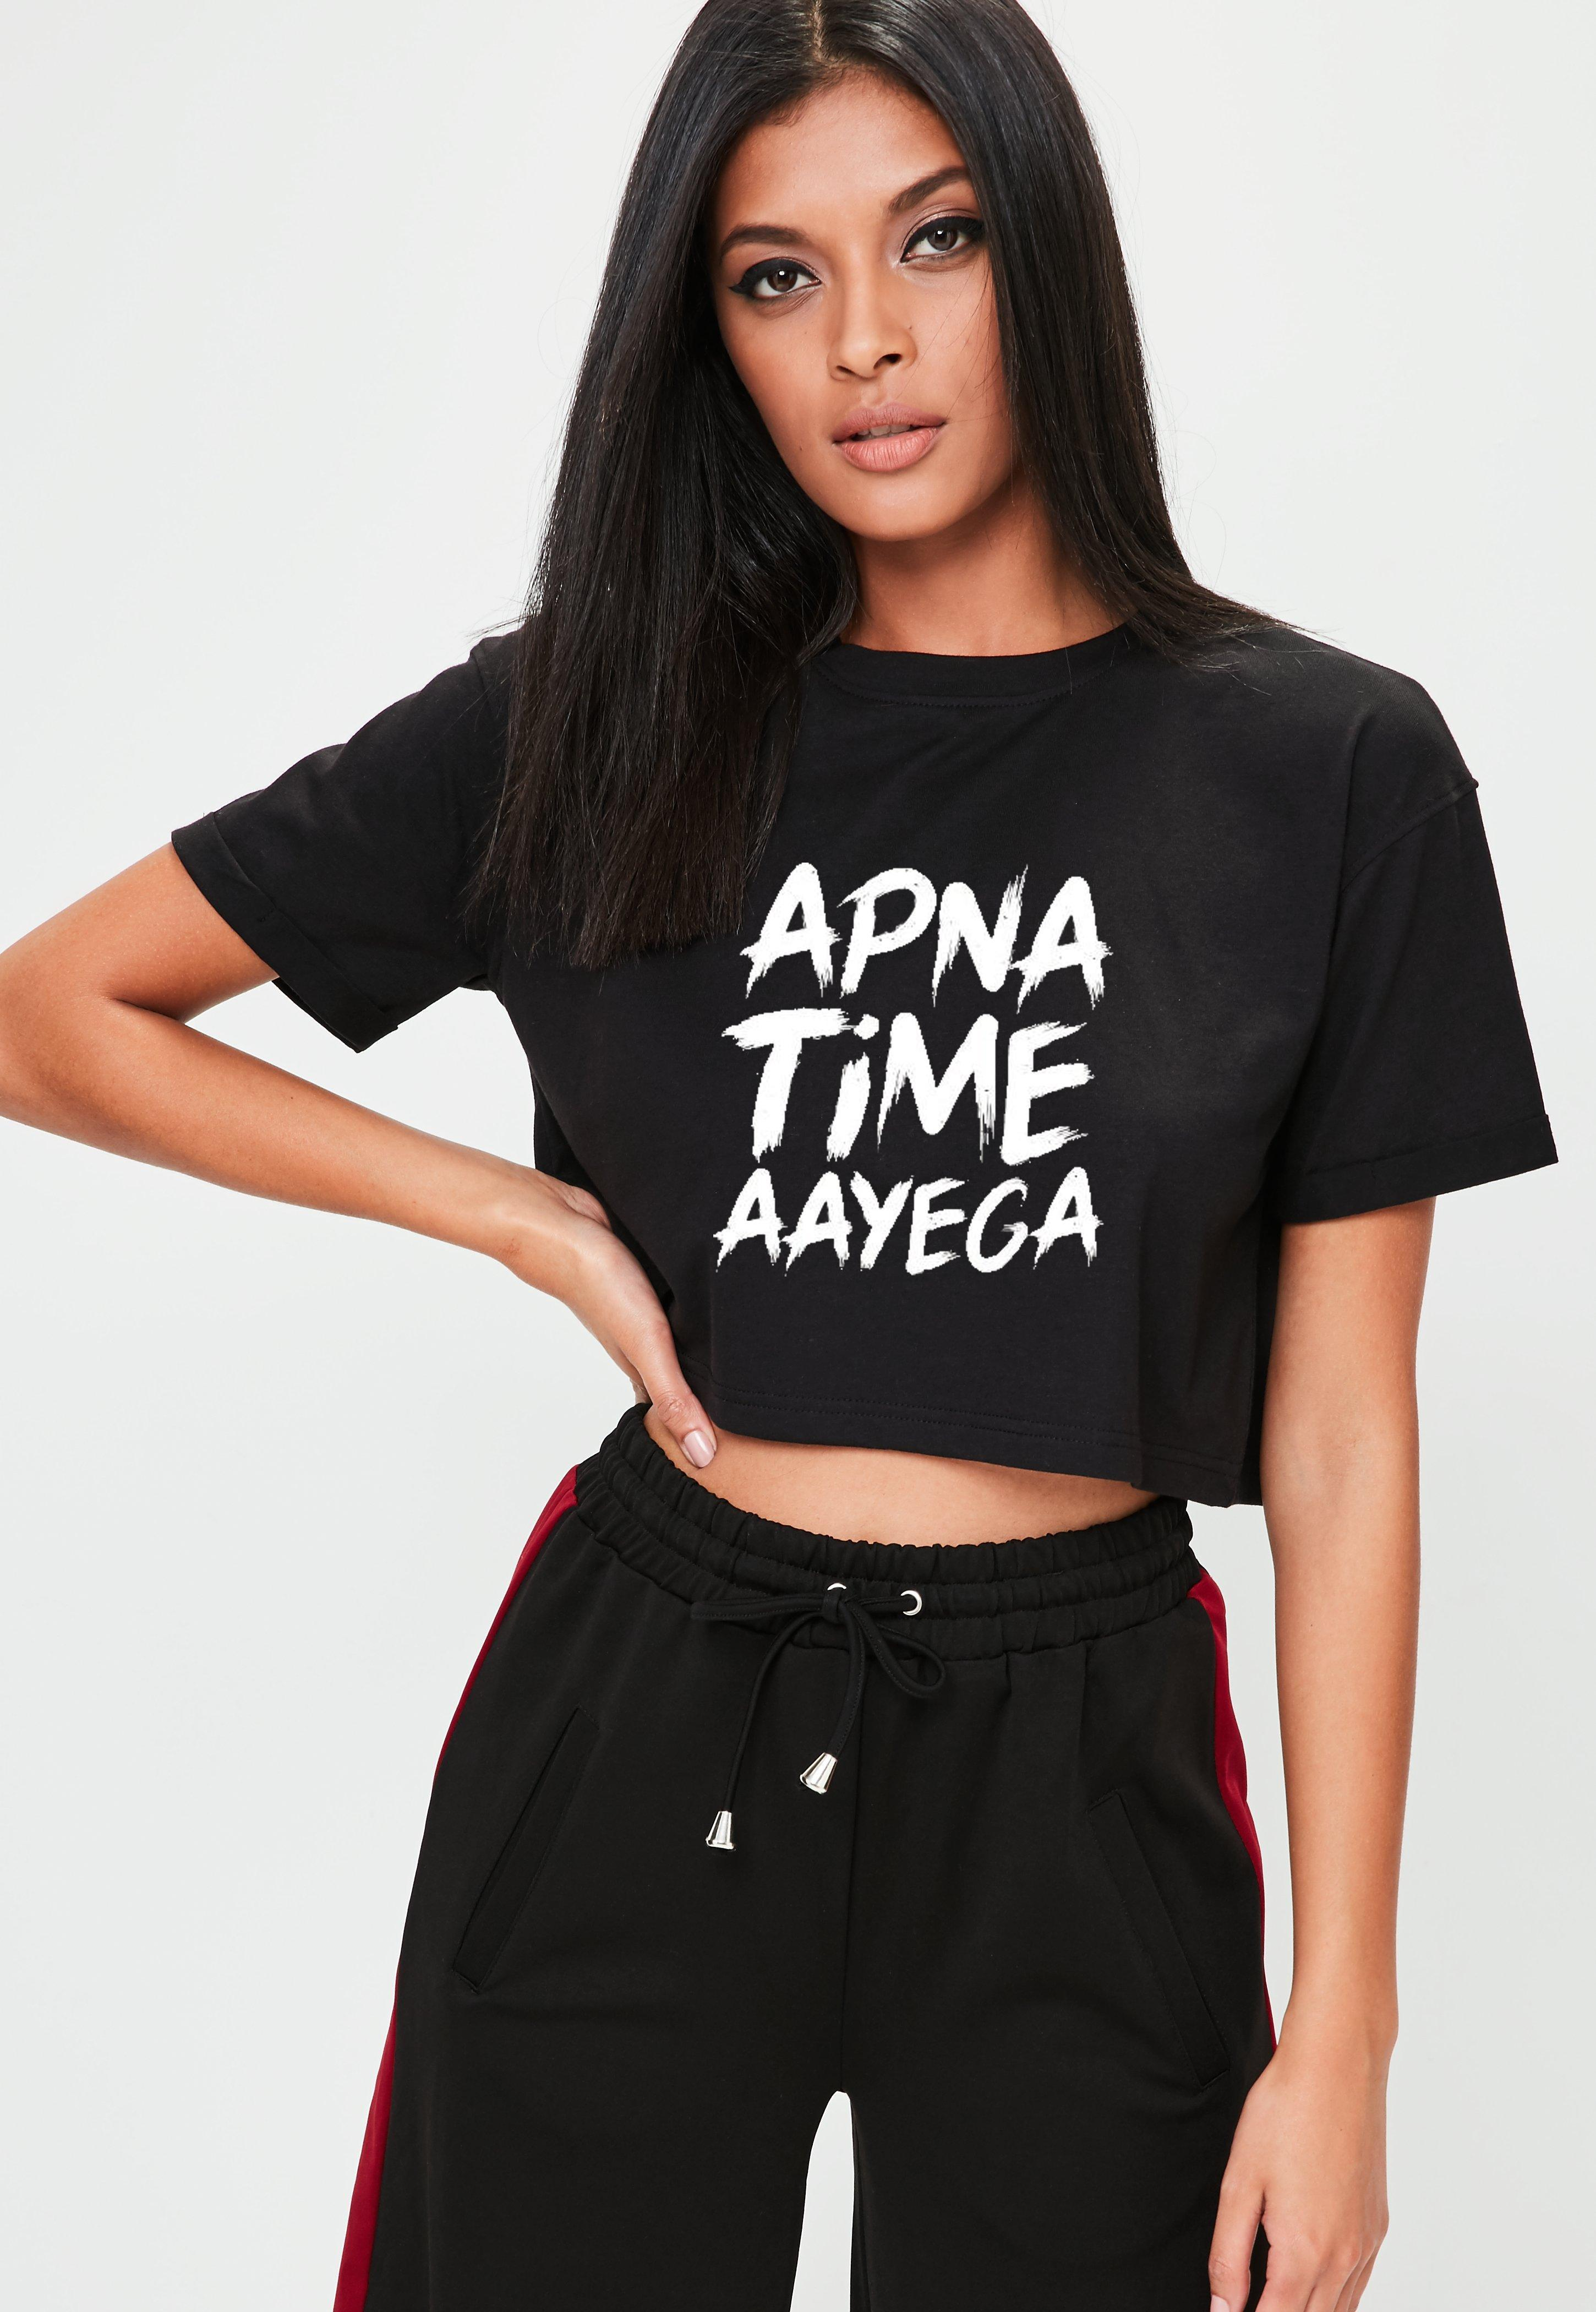 850987e8 Buy Women T-Shirts Online @ Best Price in Pakistan - Daraz.pk